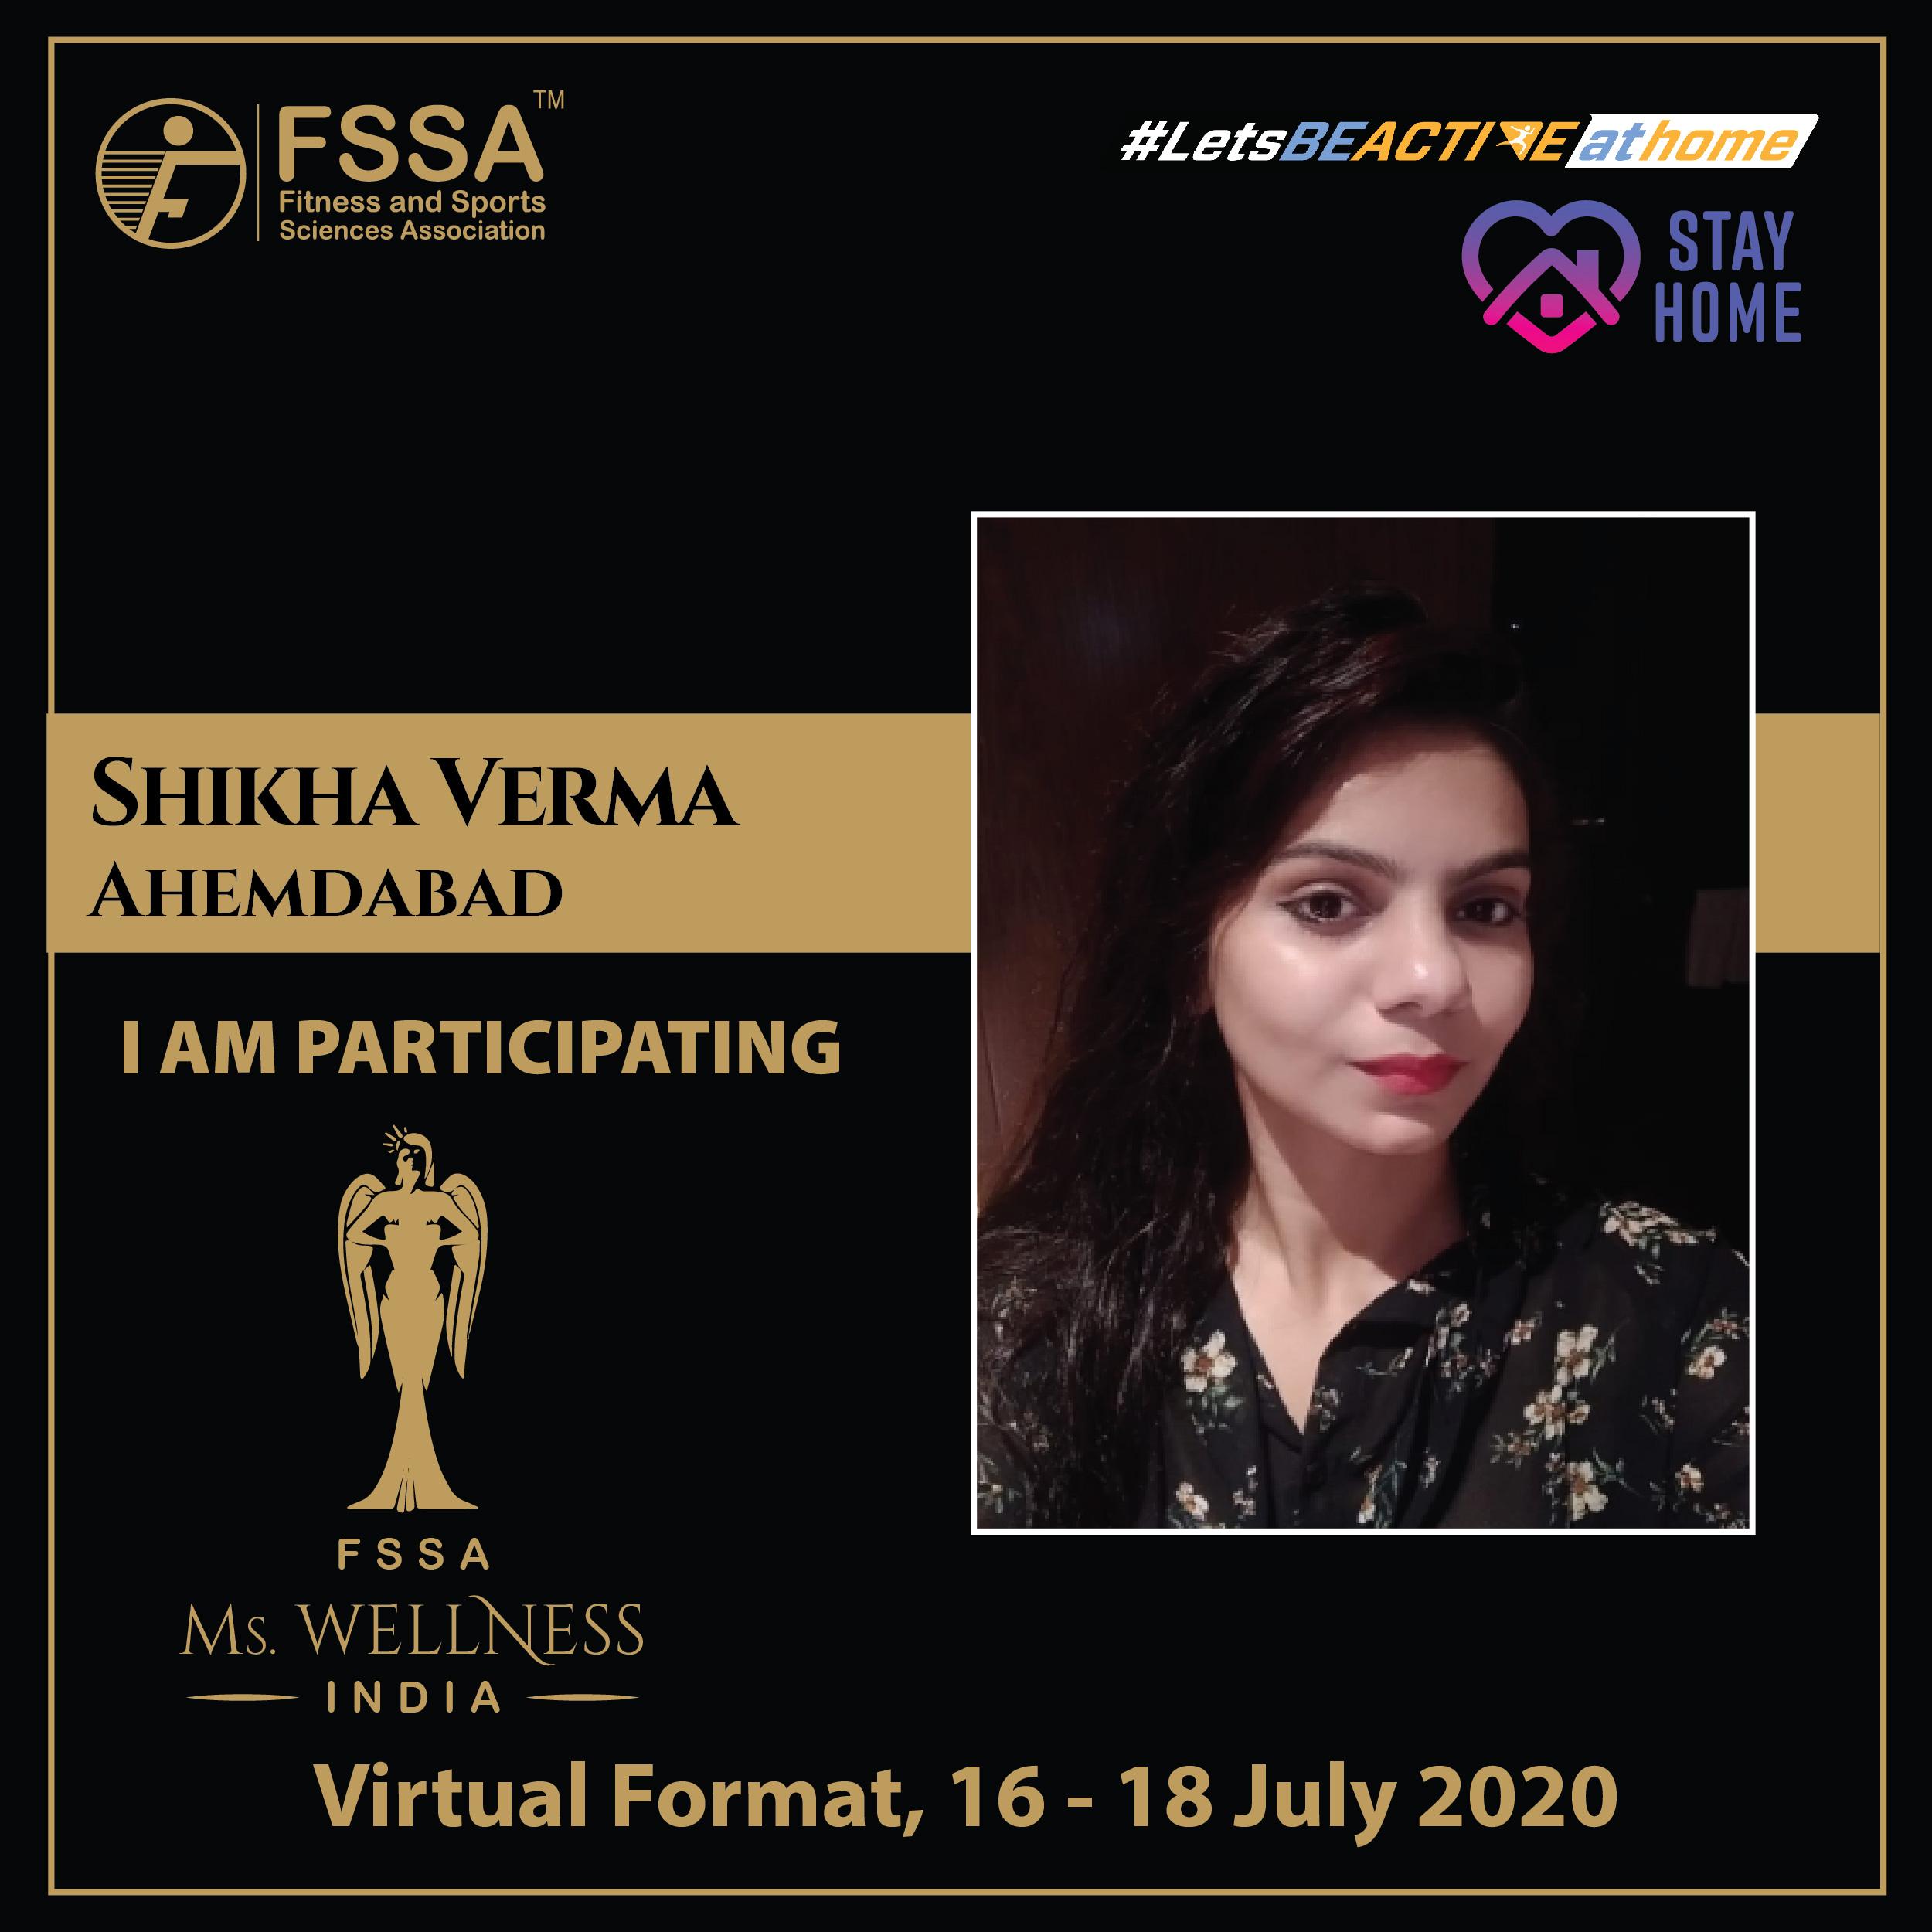 25-Shikha-Verma